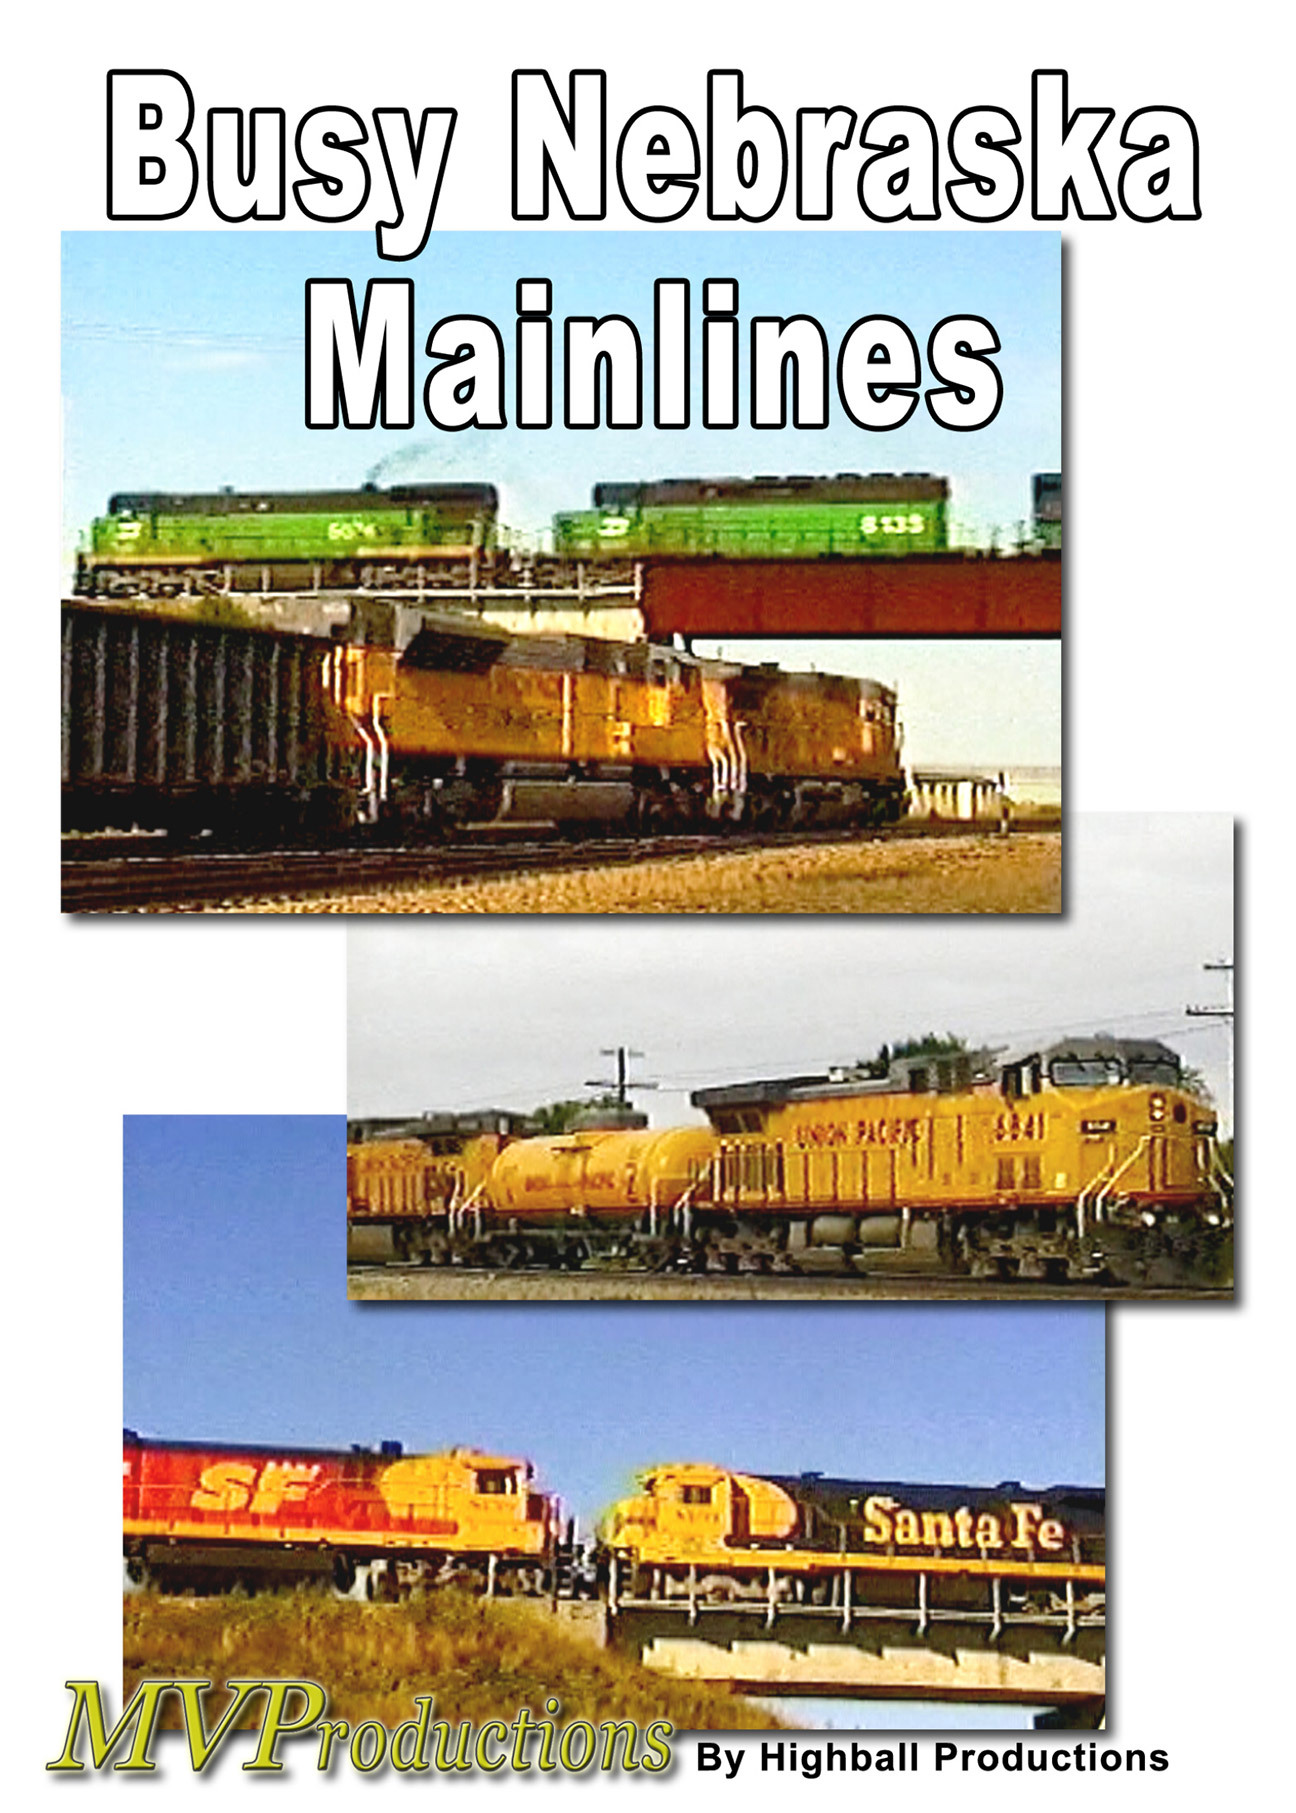 Busy Nebraska Mainlines Train Video Midwest Video Productions MVBNM 601577880271